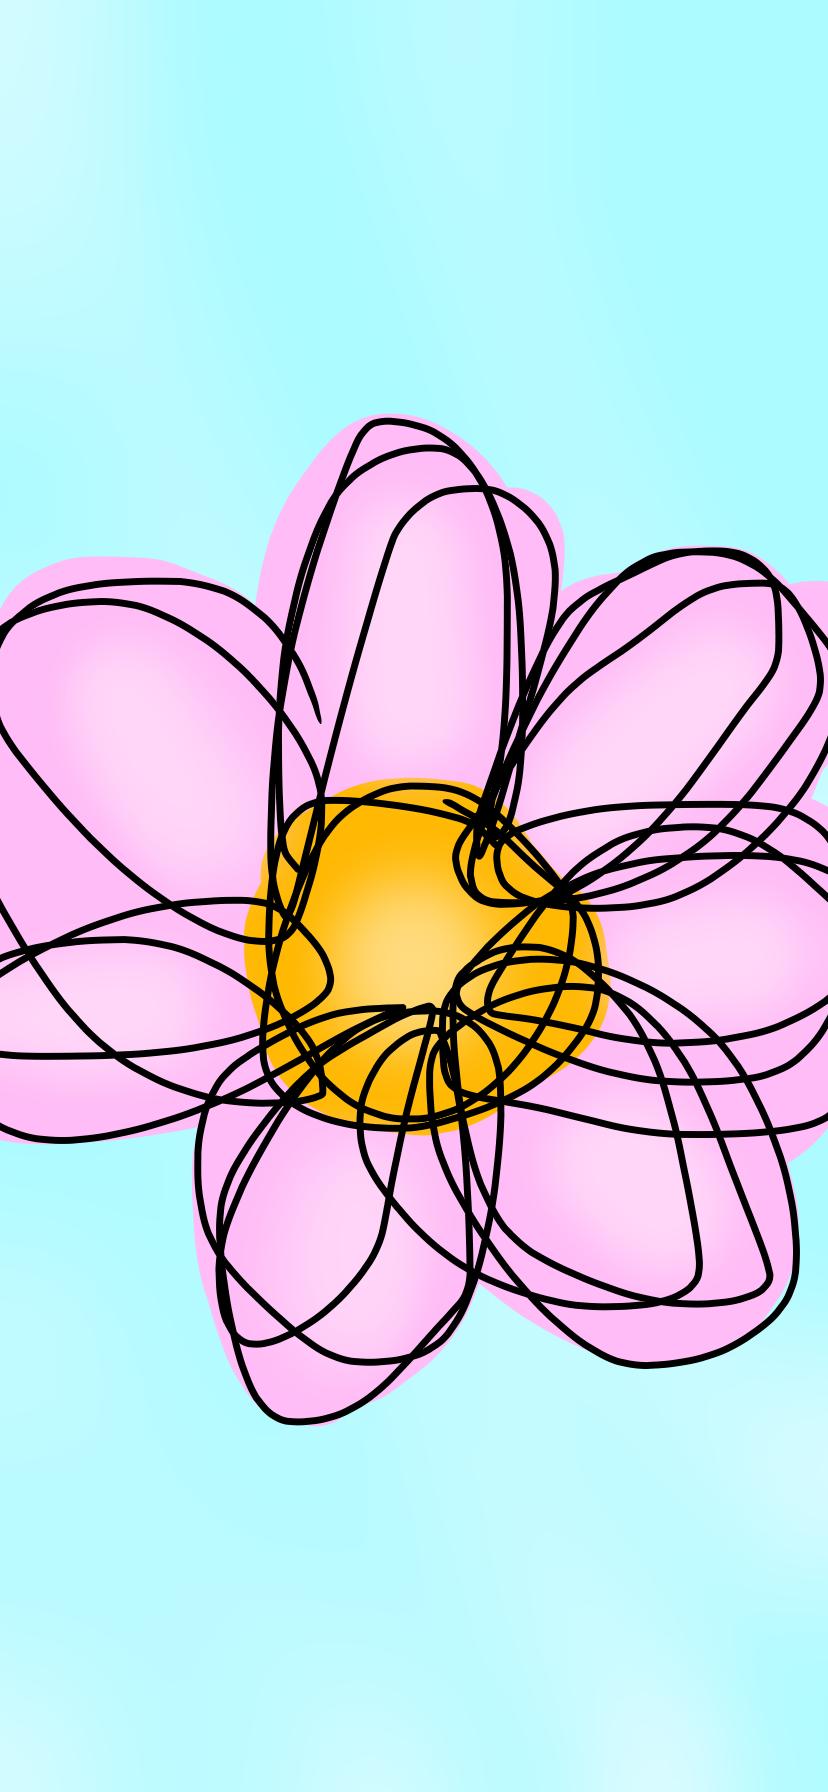 pinkflower Illust of BakugouMae April2021_Flower medibangpaint